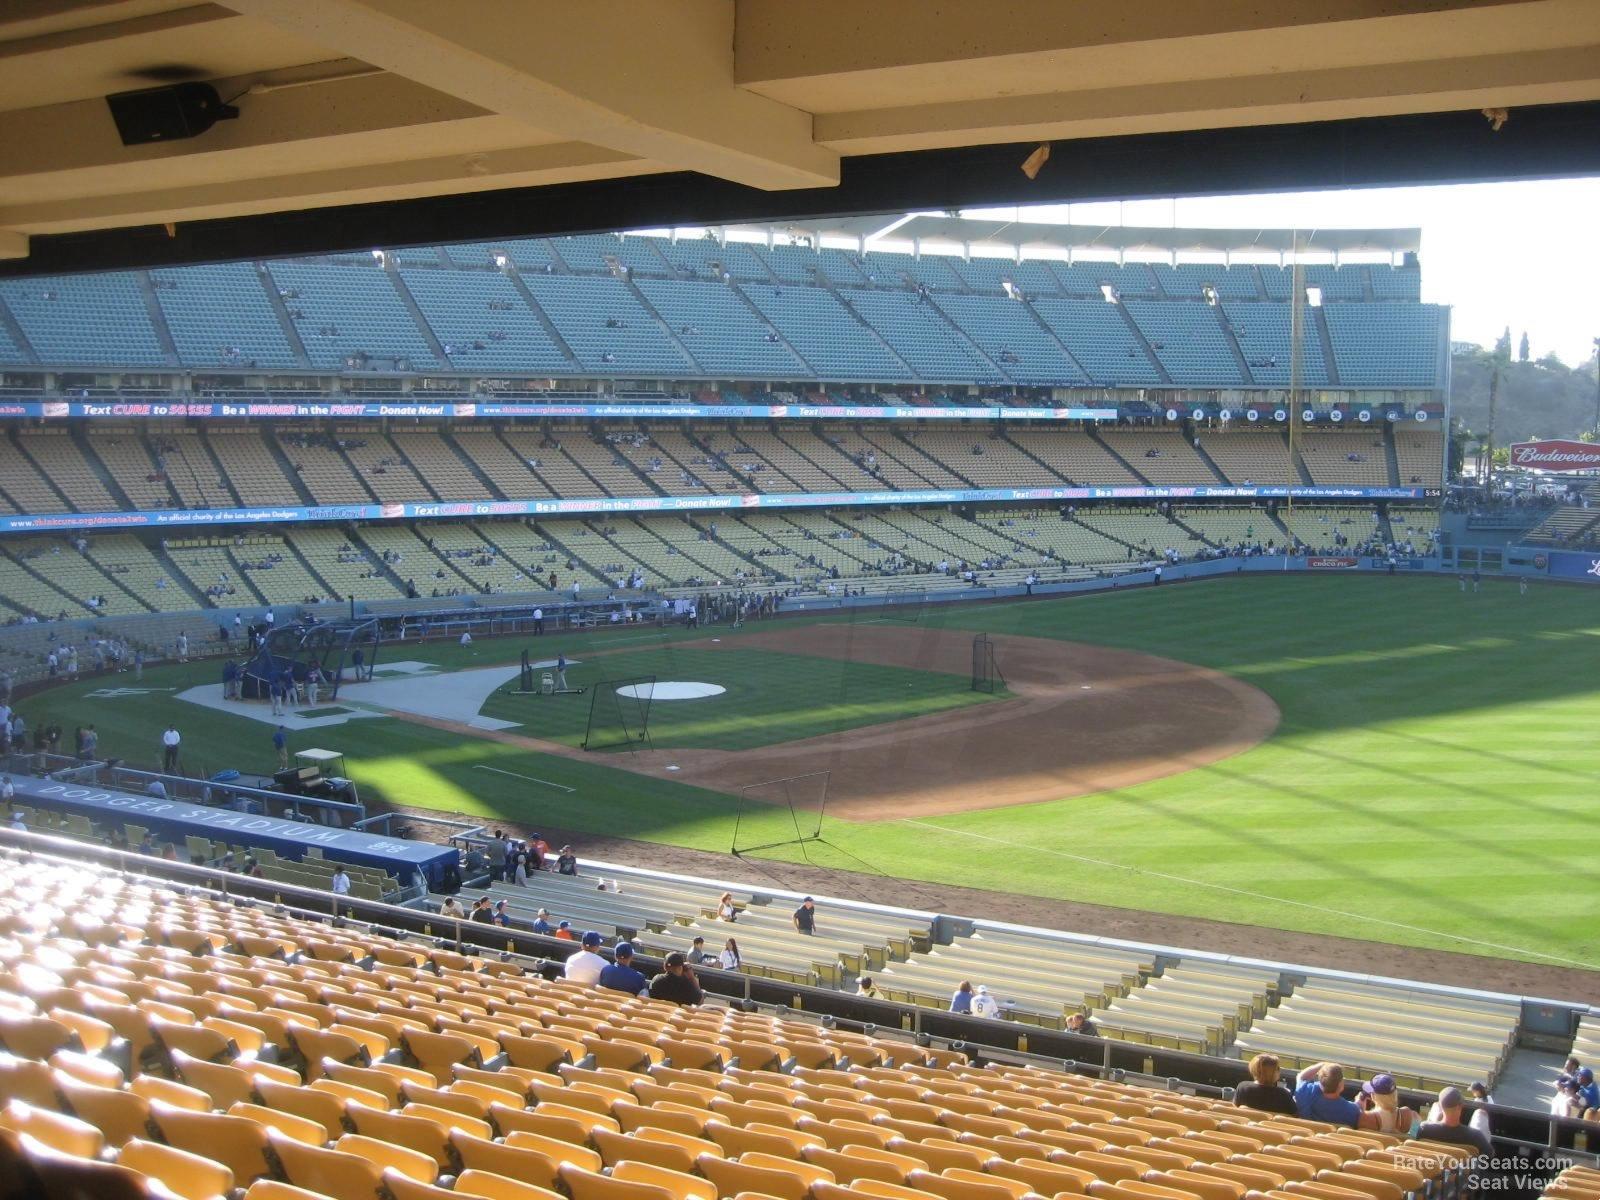 Dodger Stadium Section 150 - RateYourSeats.com